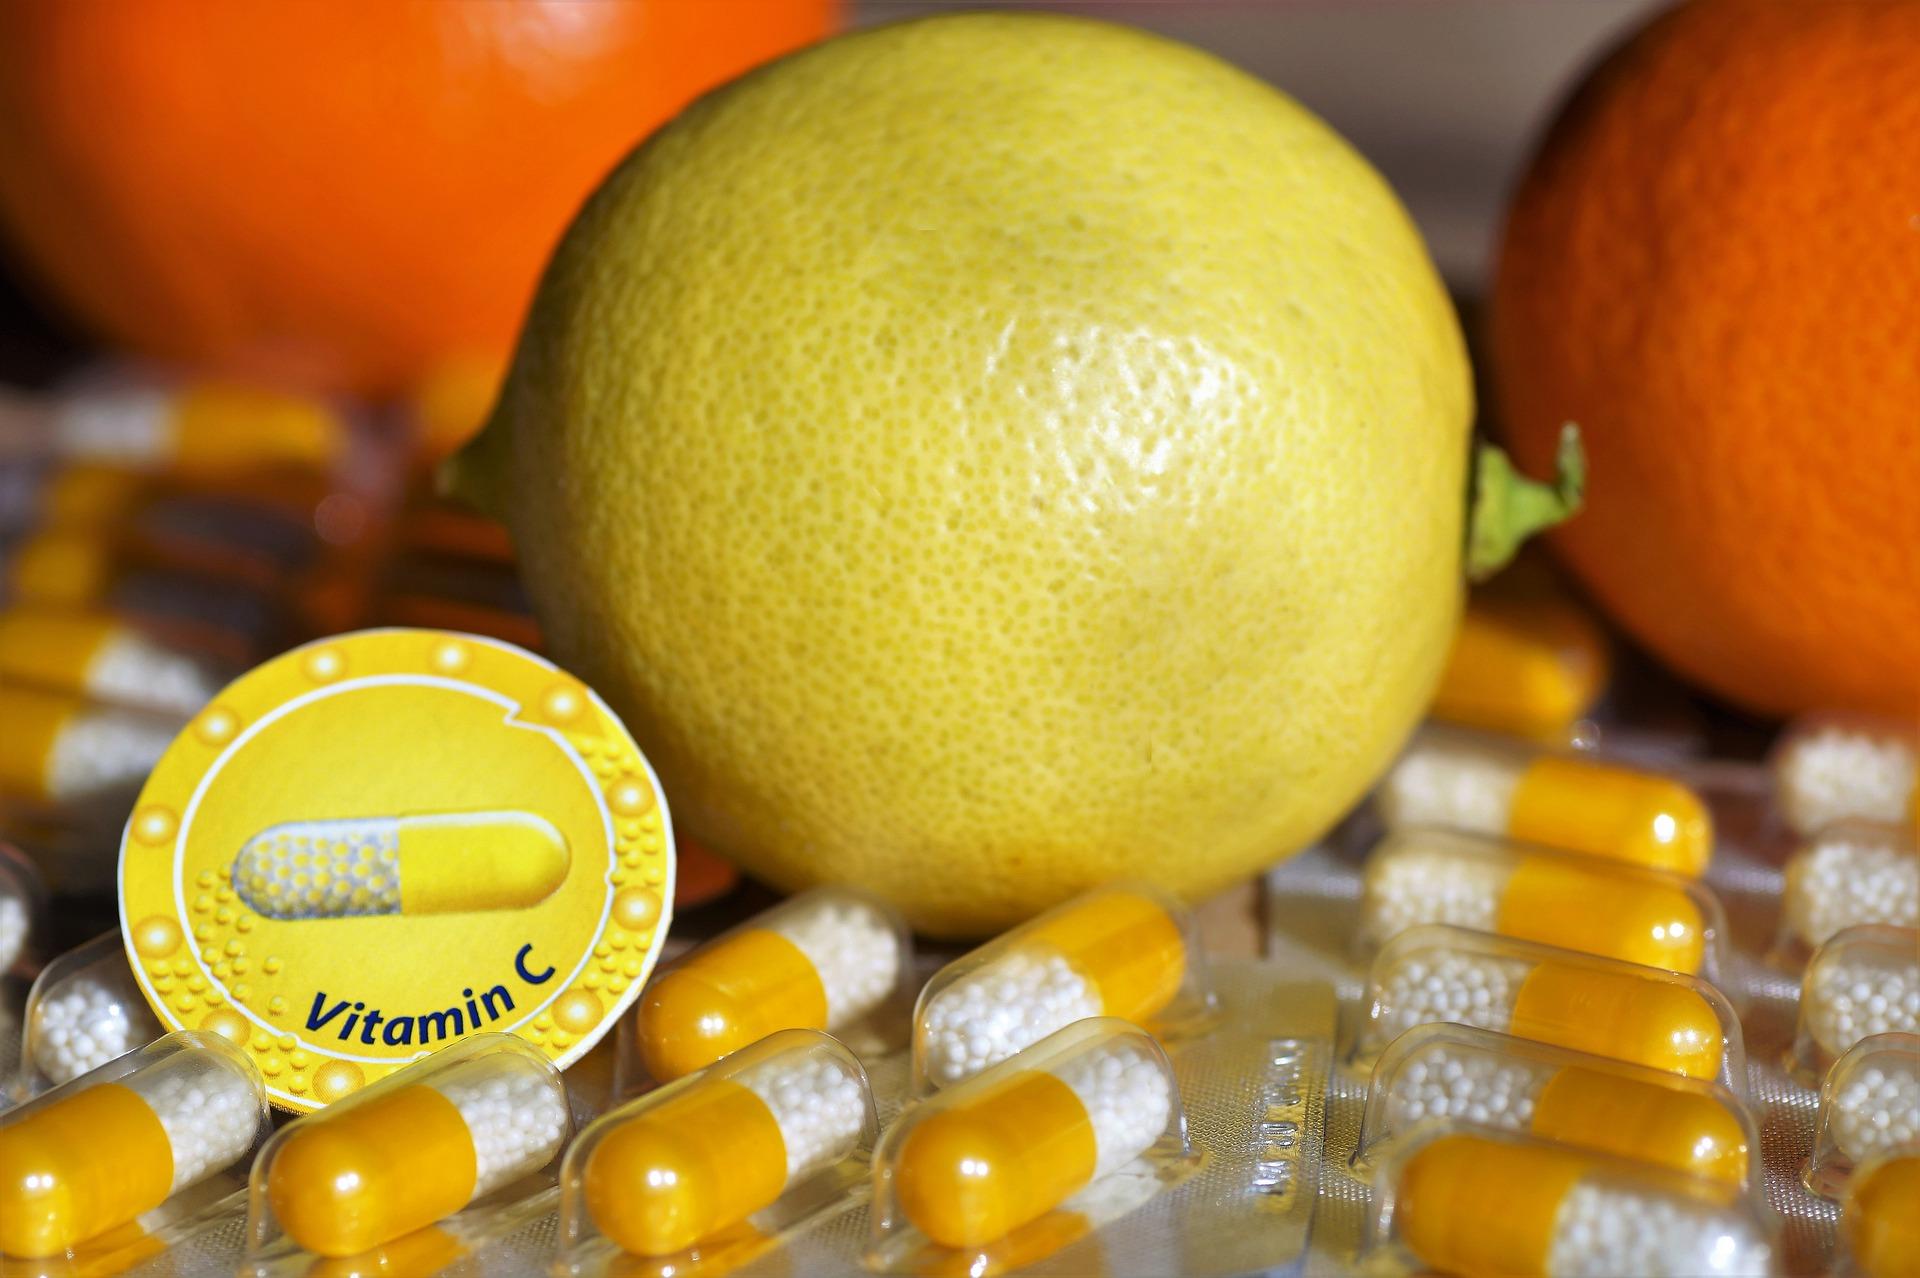 Vitamine C in coronatijd